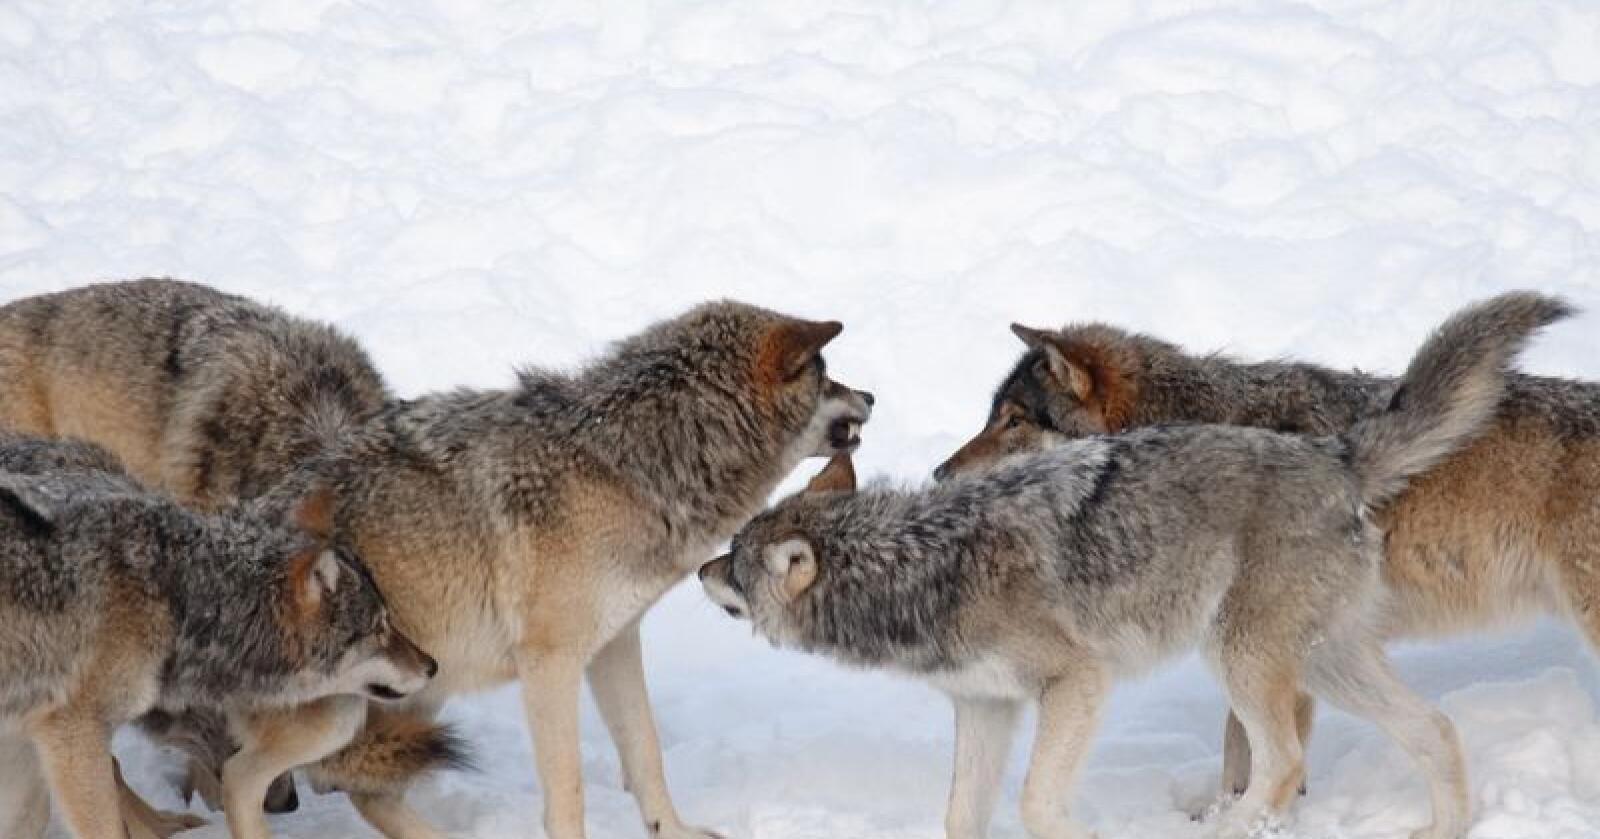 Rekordmange: Det skytes mye ulv fordi det blir stadig mer ulv. Foto: Felix A. Skulstad/Mostphotos